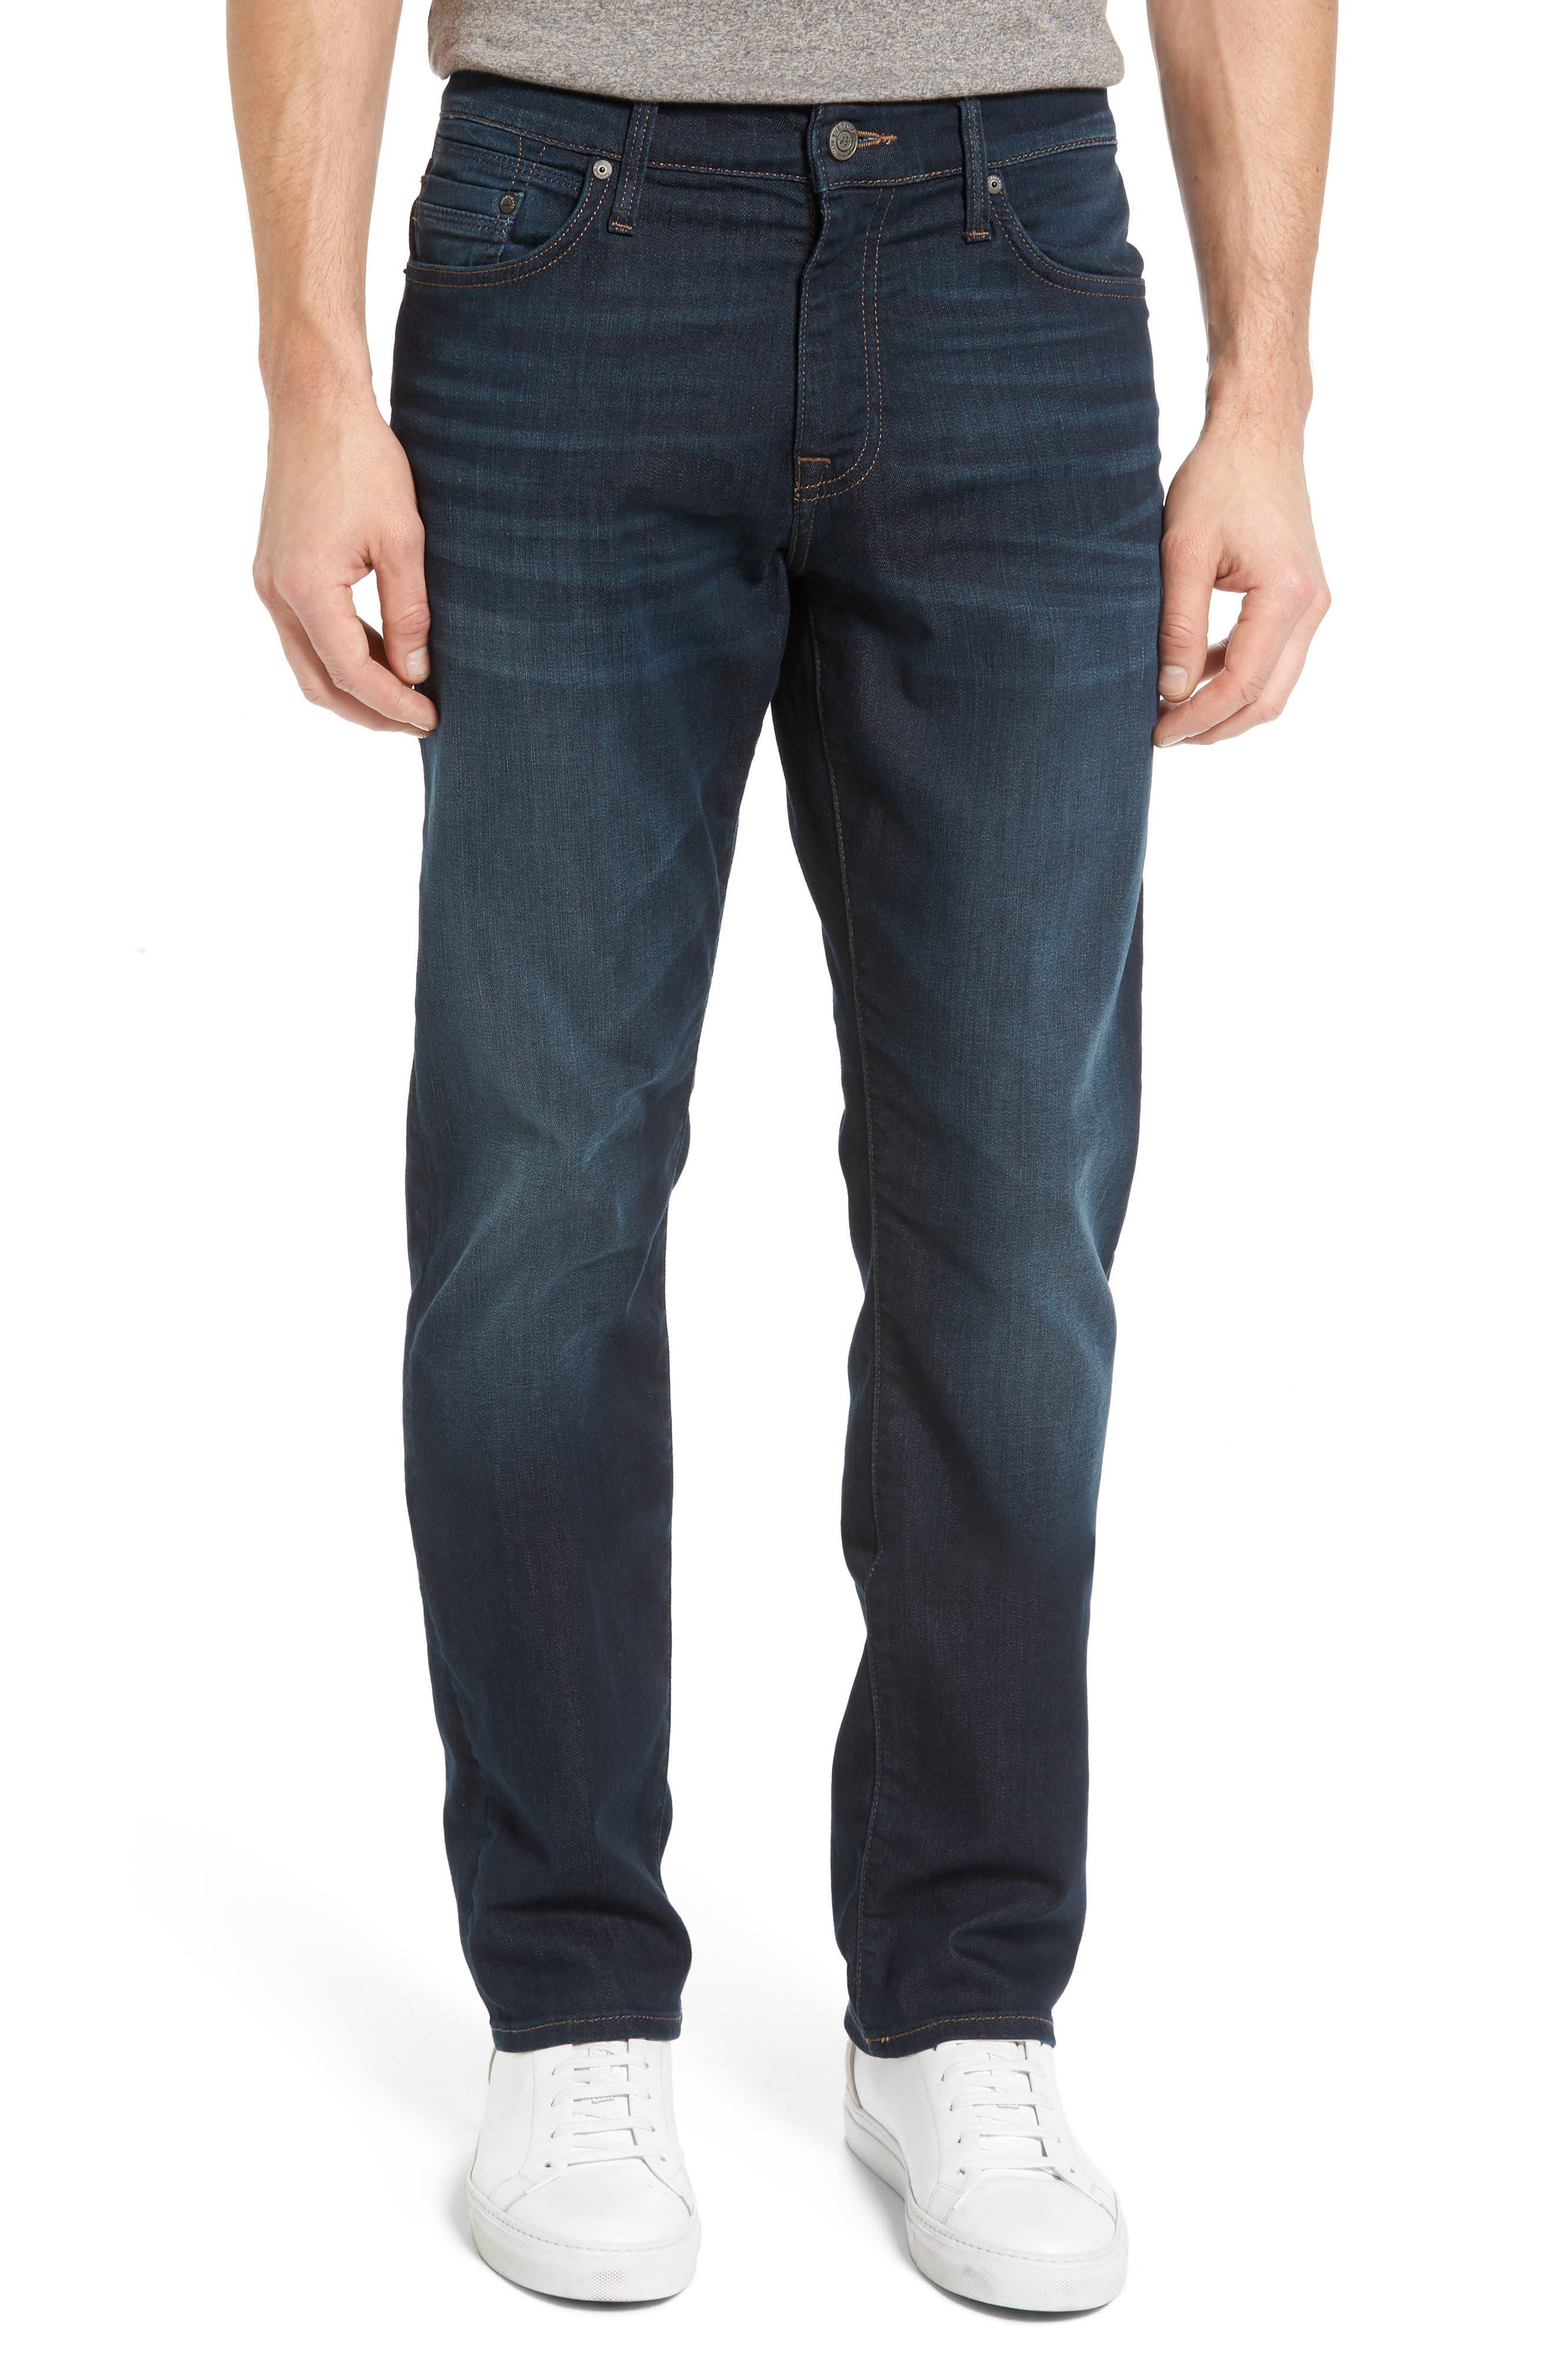 Mavi Jeans Myles Straight Leg Jeans (Deep Georgetown)